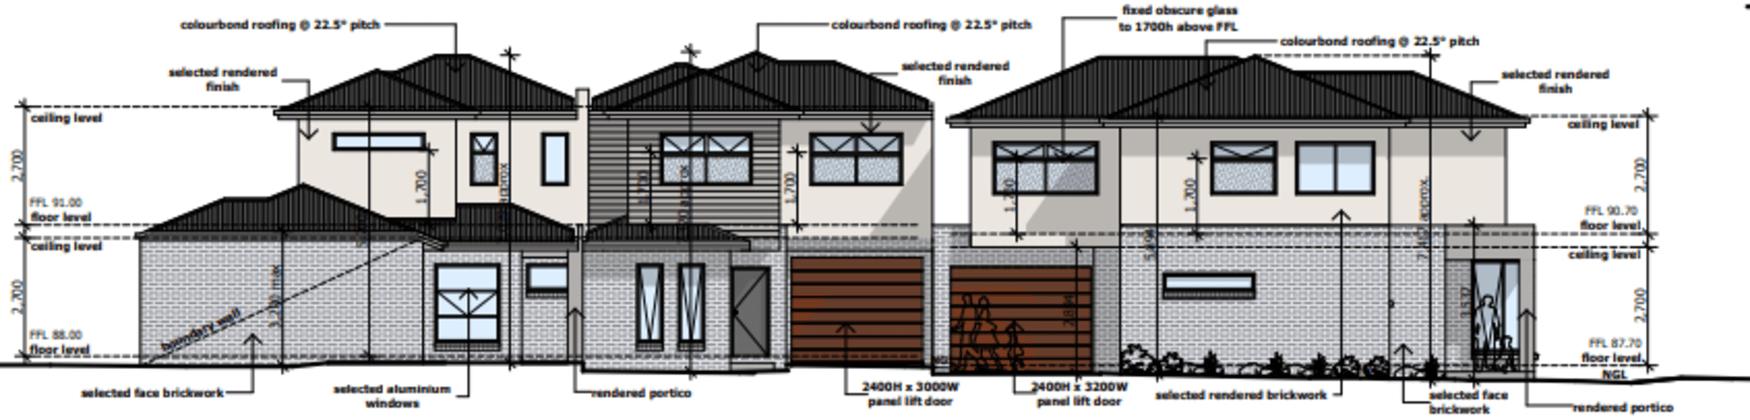 Planning Image: Xpress Building Design Group